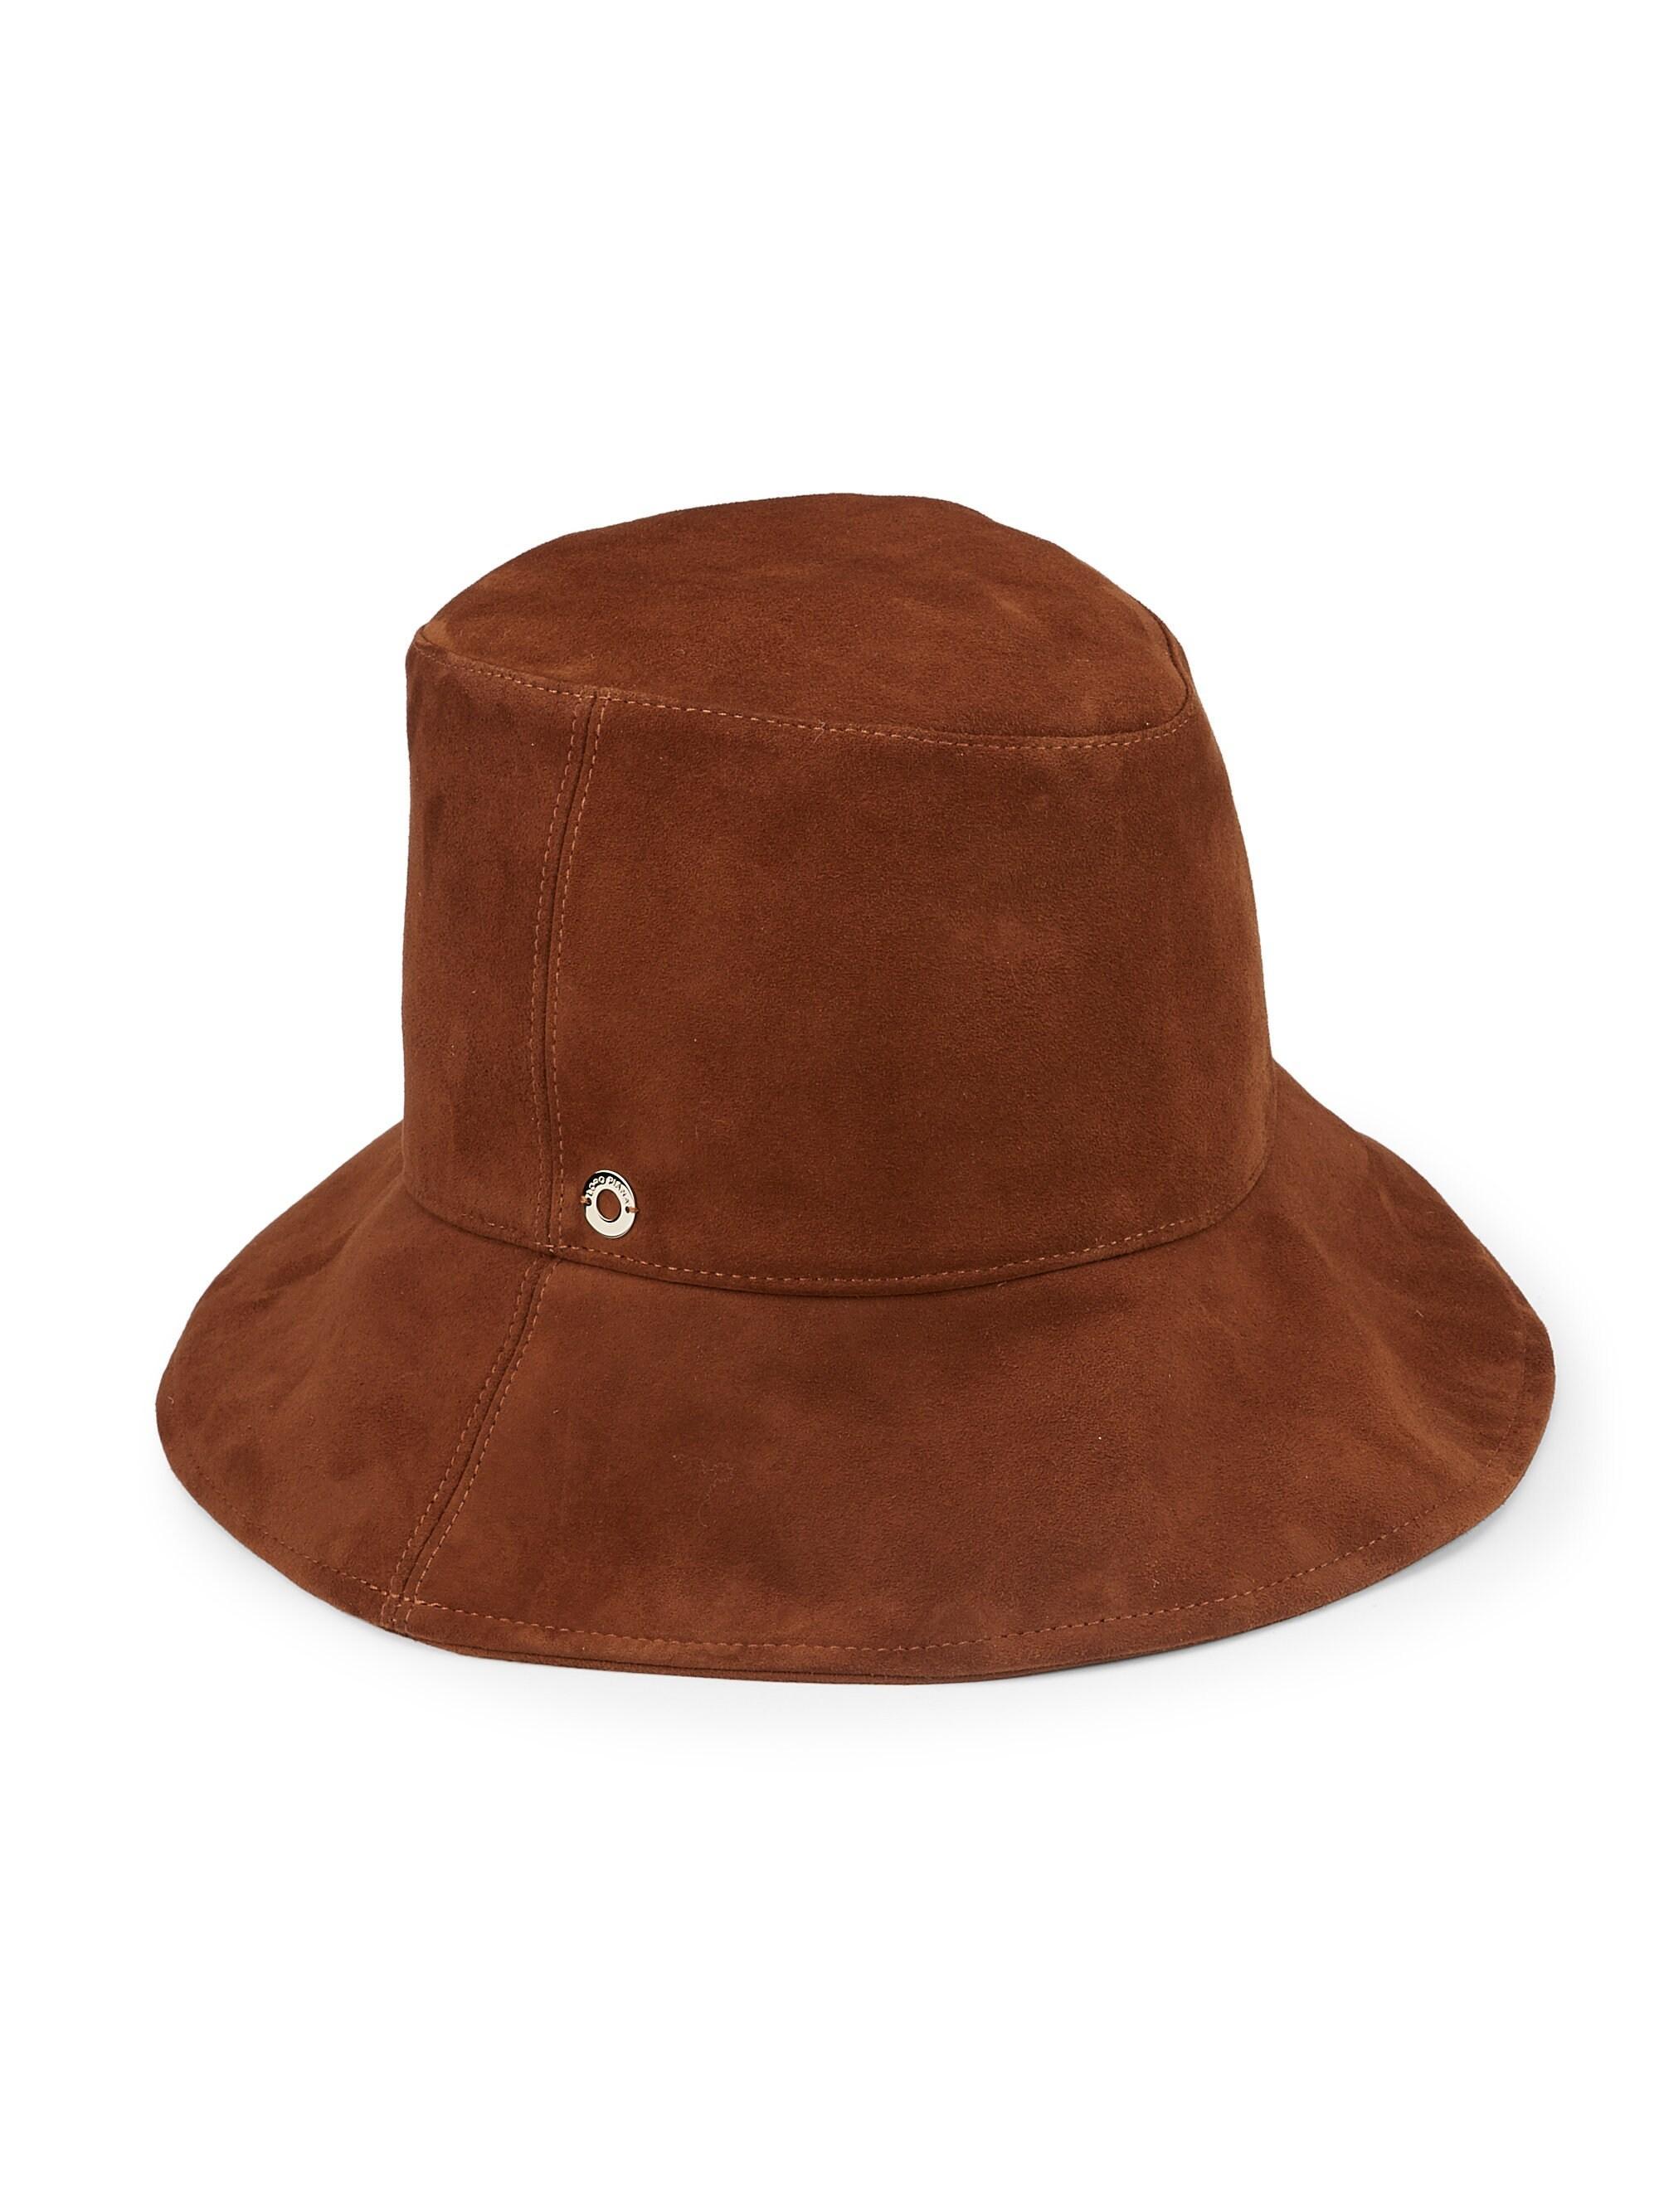 13ed555e0b2 Loro Piana Nellie Suede Bucket Hat in Brown - Lyst